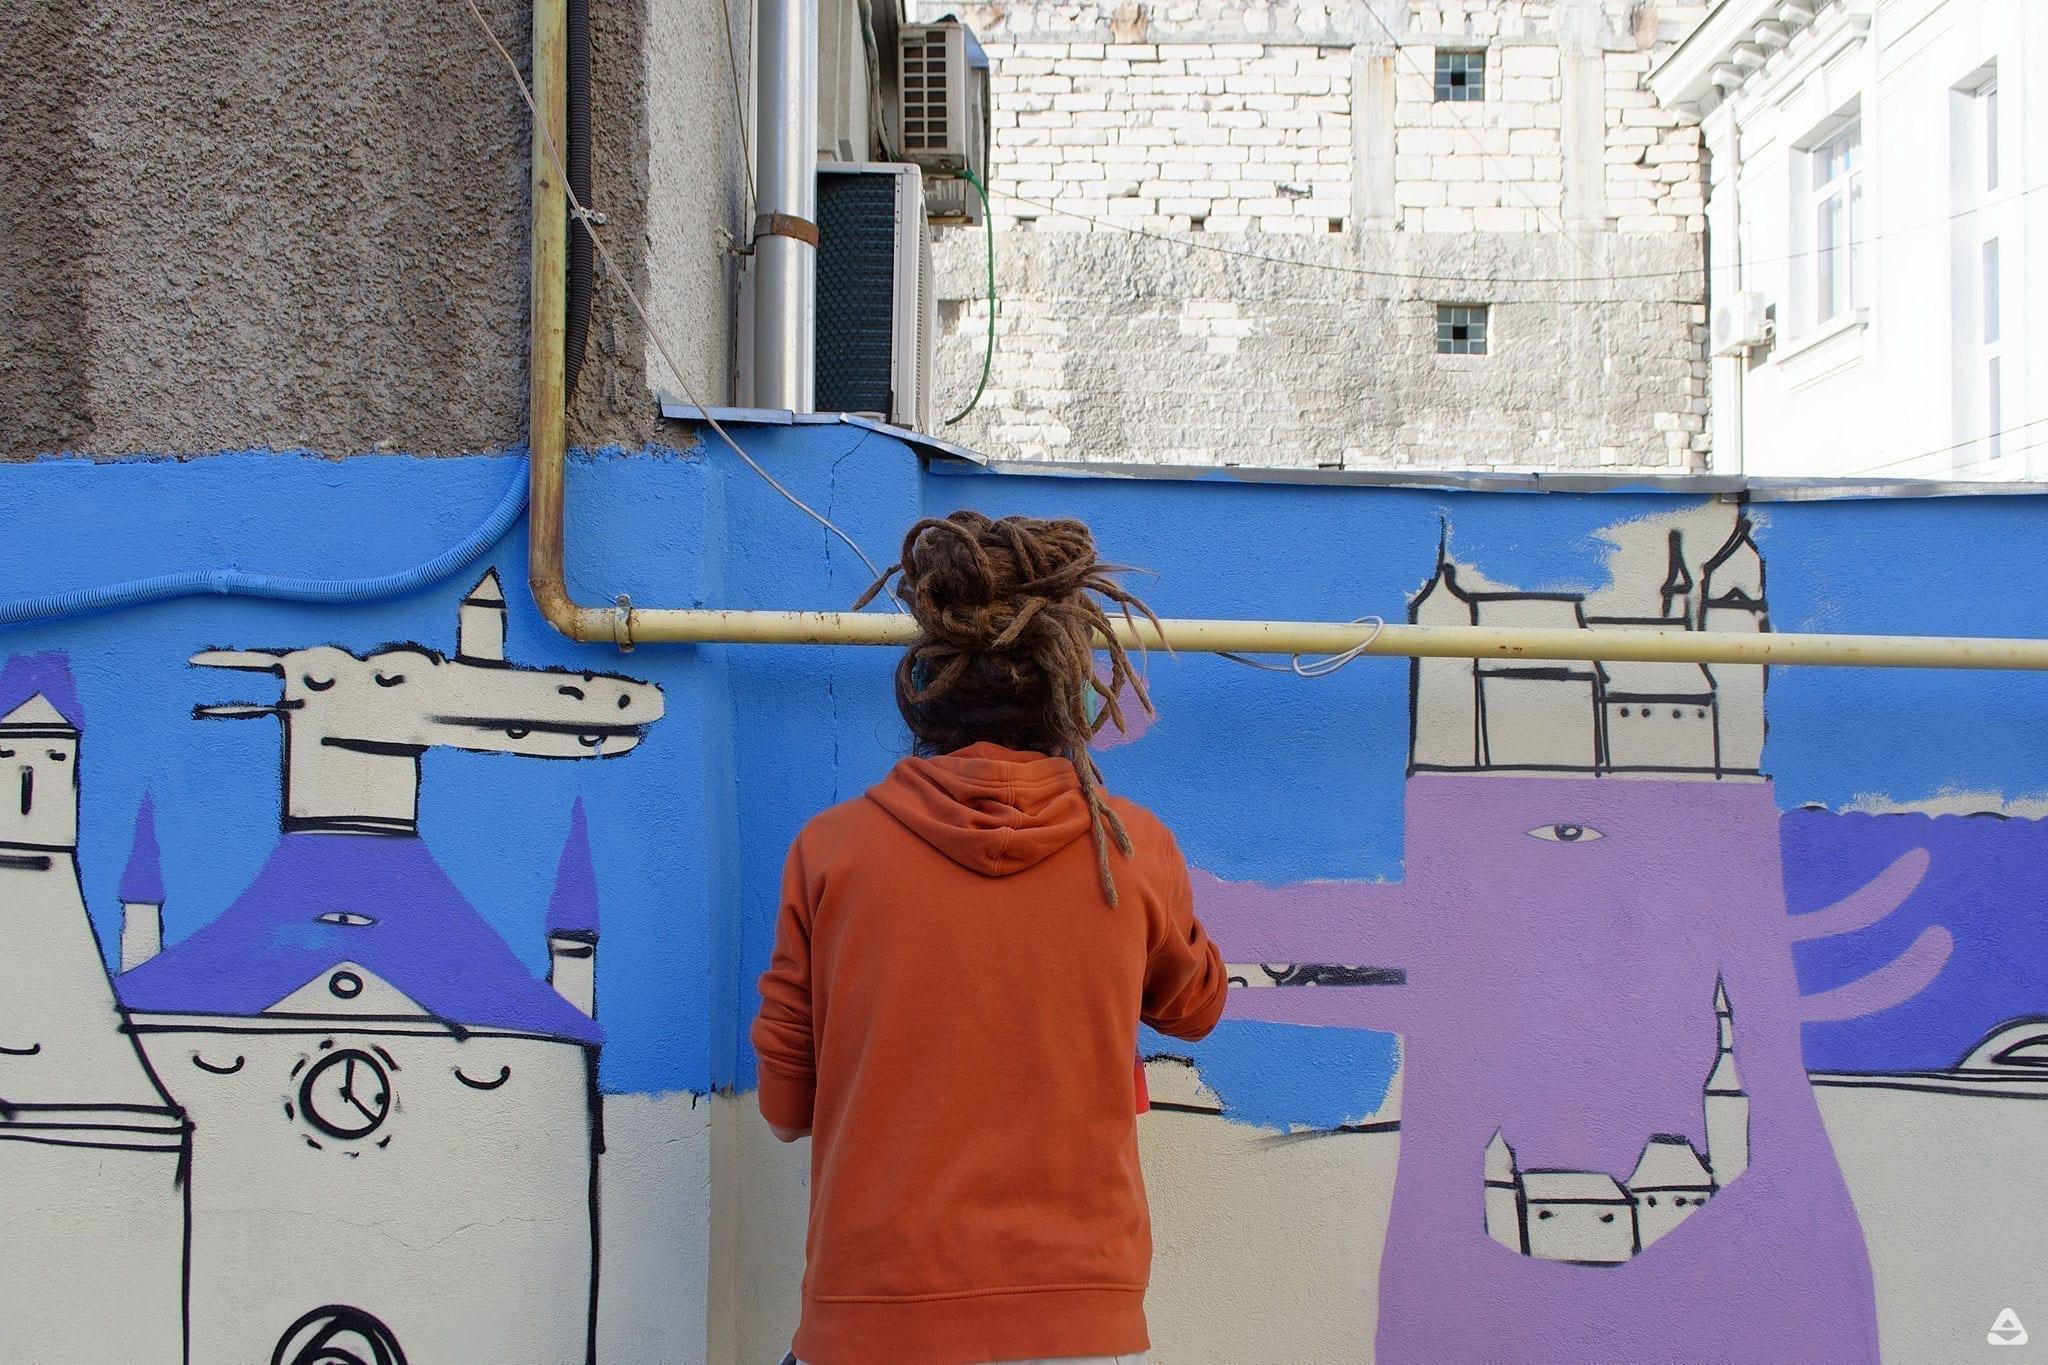 Un-hidden Bucharest Lucian Nita - KSELEQOQYNQYSHY mural Facultatea de Sociologie